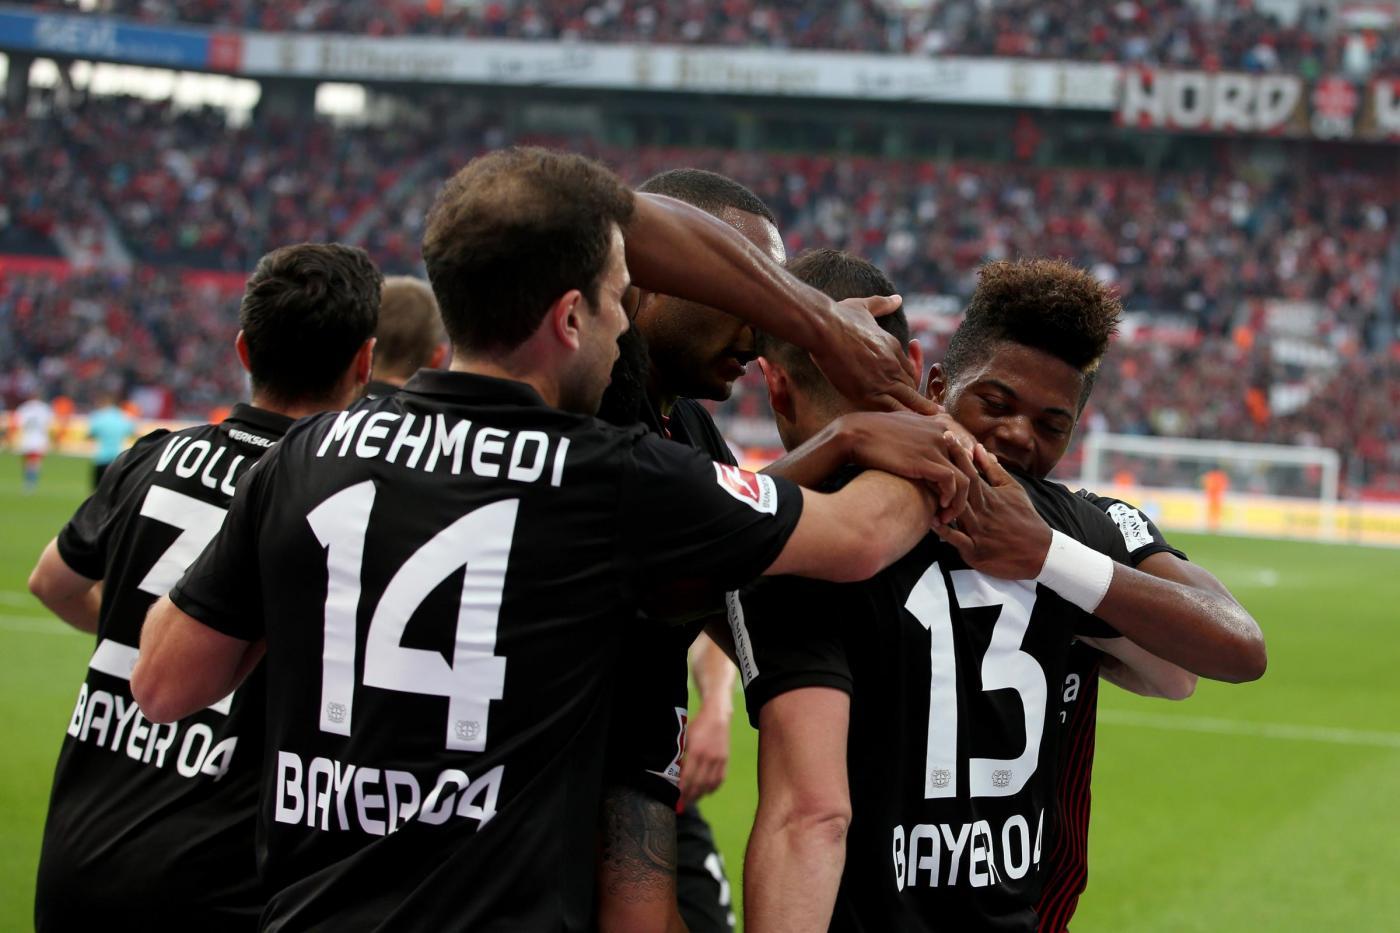 Europa League, Bayer Leverkusen-Krasnodar: vittoria facile per i tedeschi?